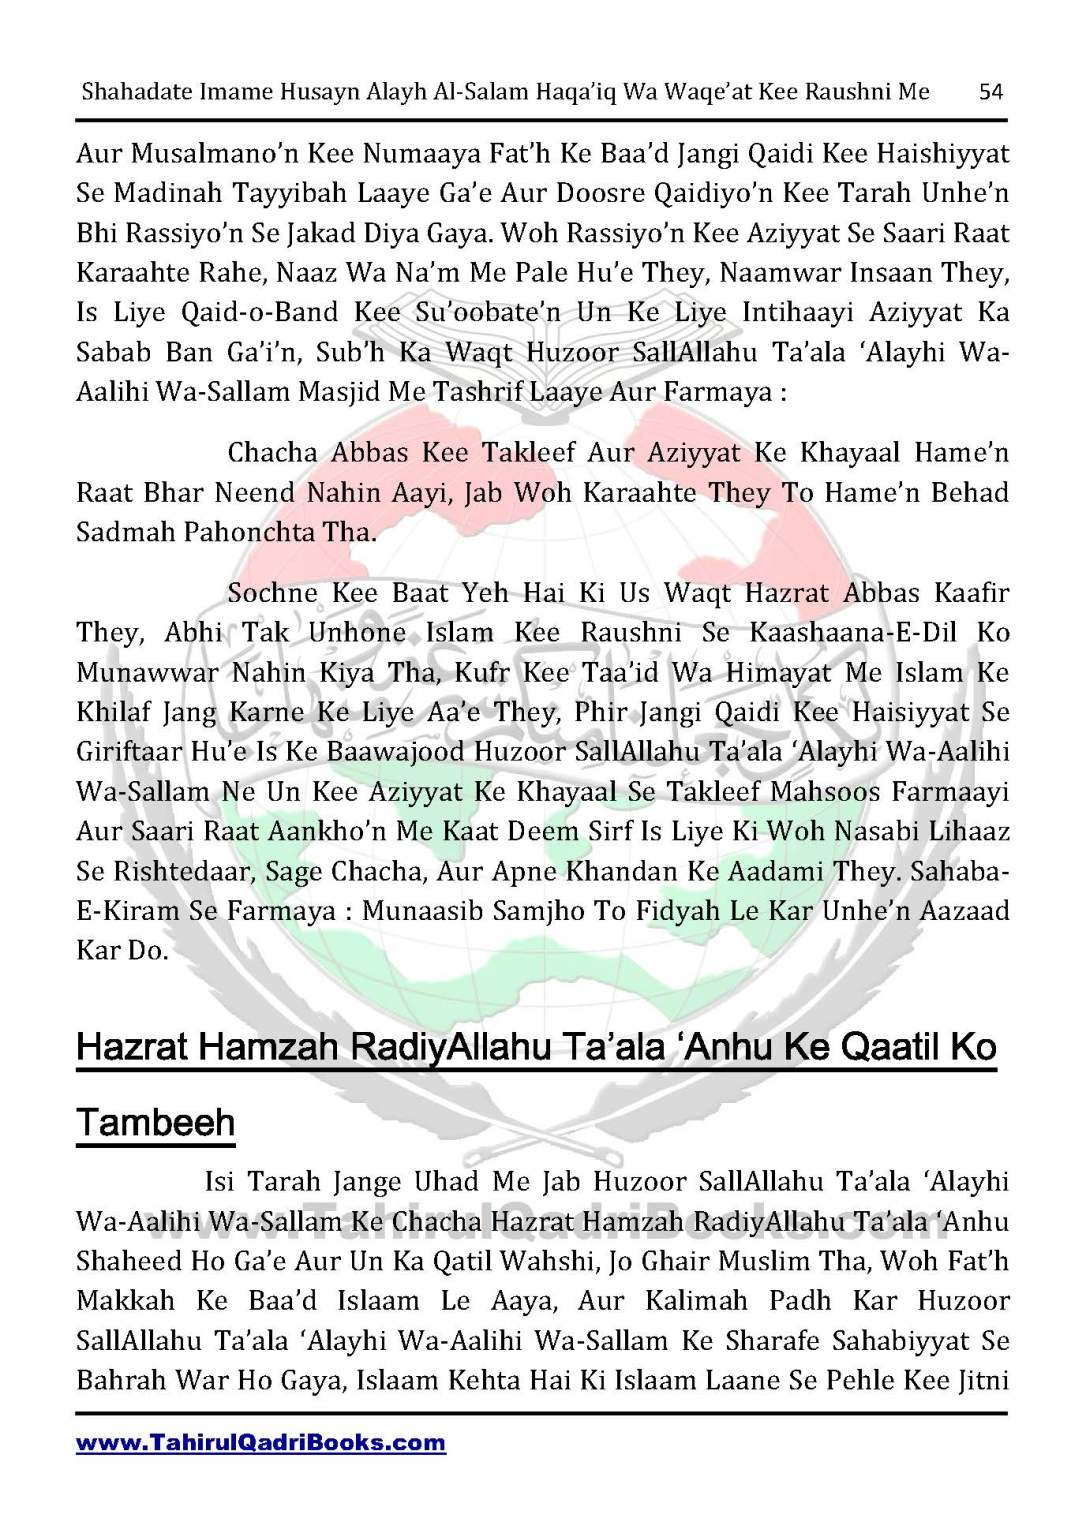 shahadate-imame-husayn-alayh-is-salam-haqaiq-wa-waqe_at-kee-raushni-me-in-roman-urdu-unlocked_Page_54